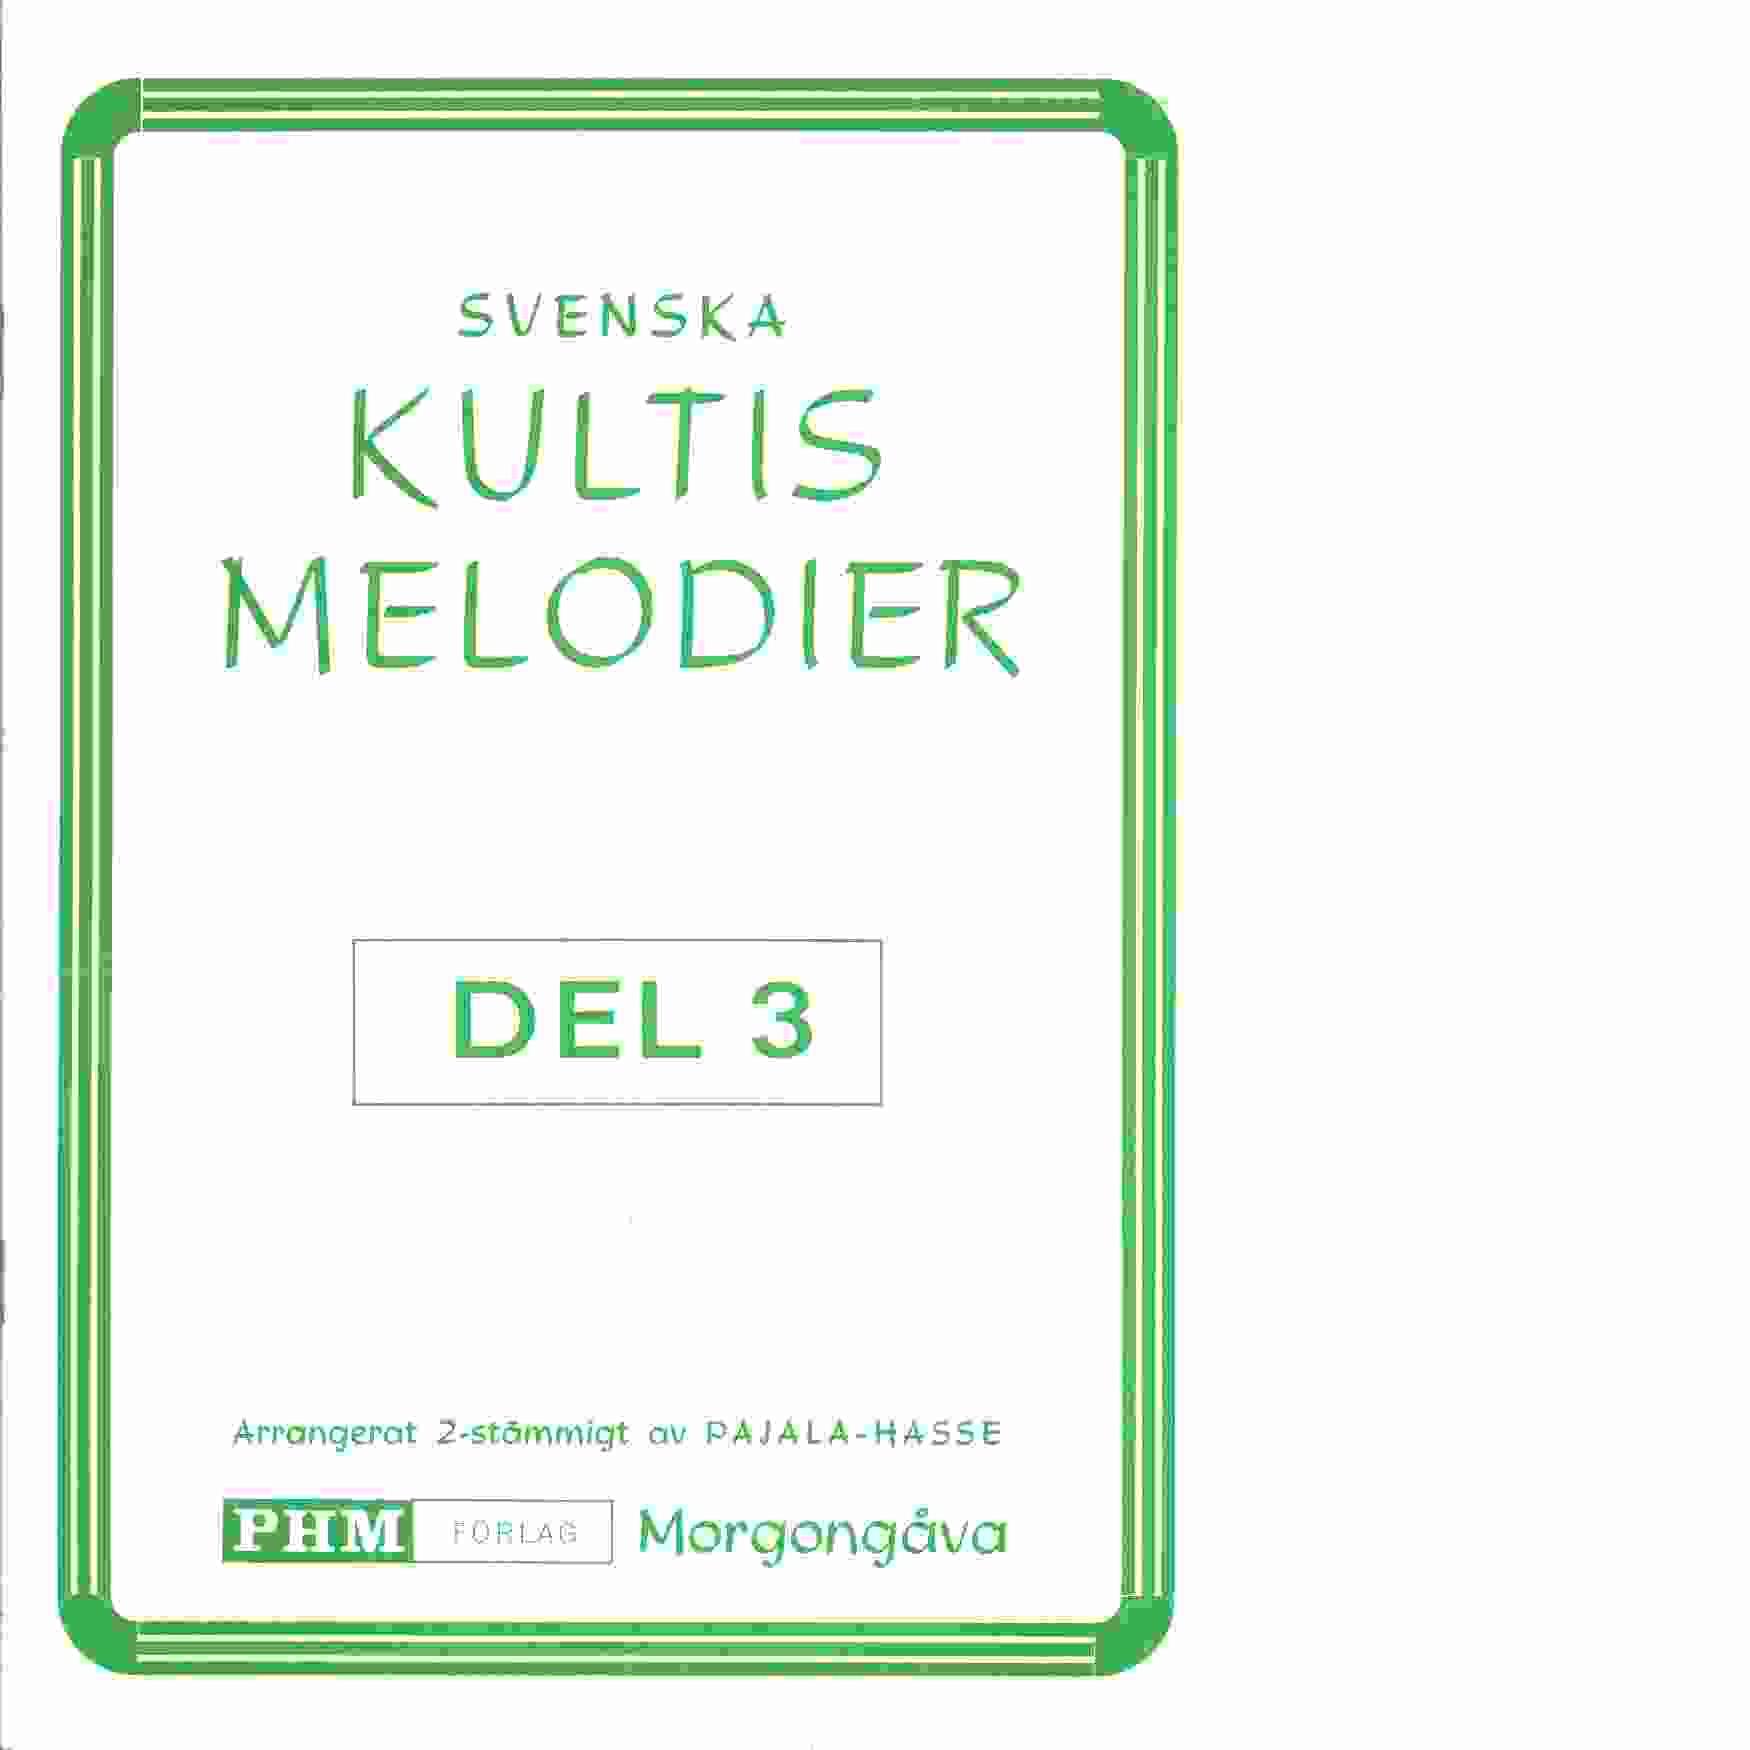 Svenska kultis melodier del 3 - Pajala-Hasse